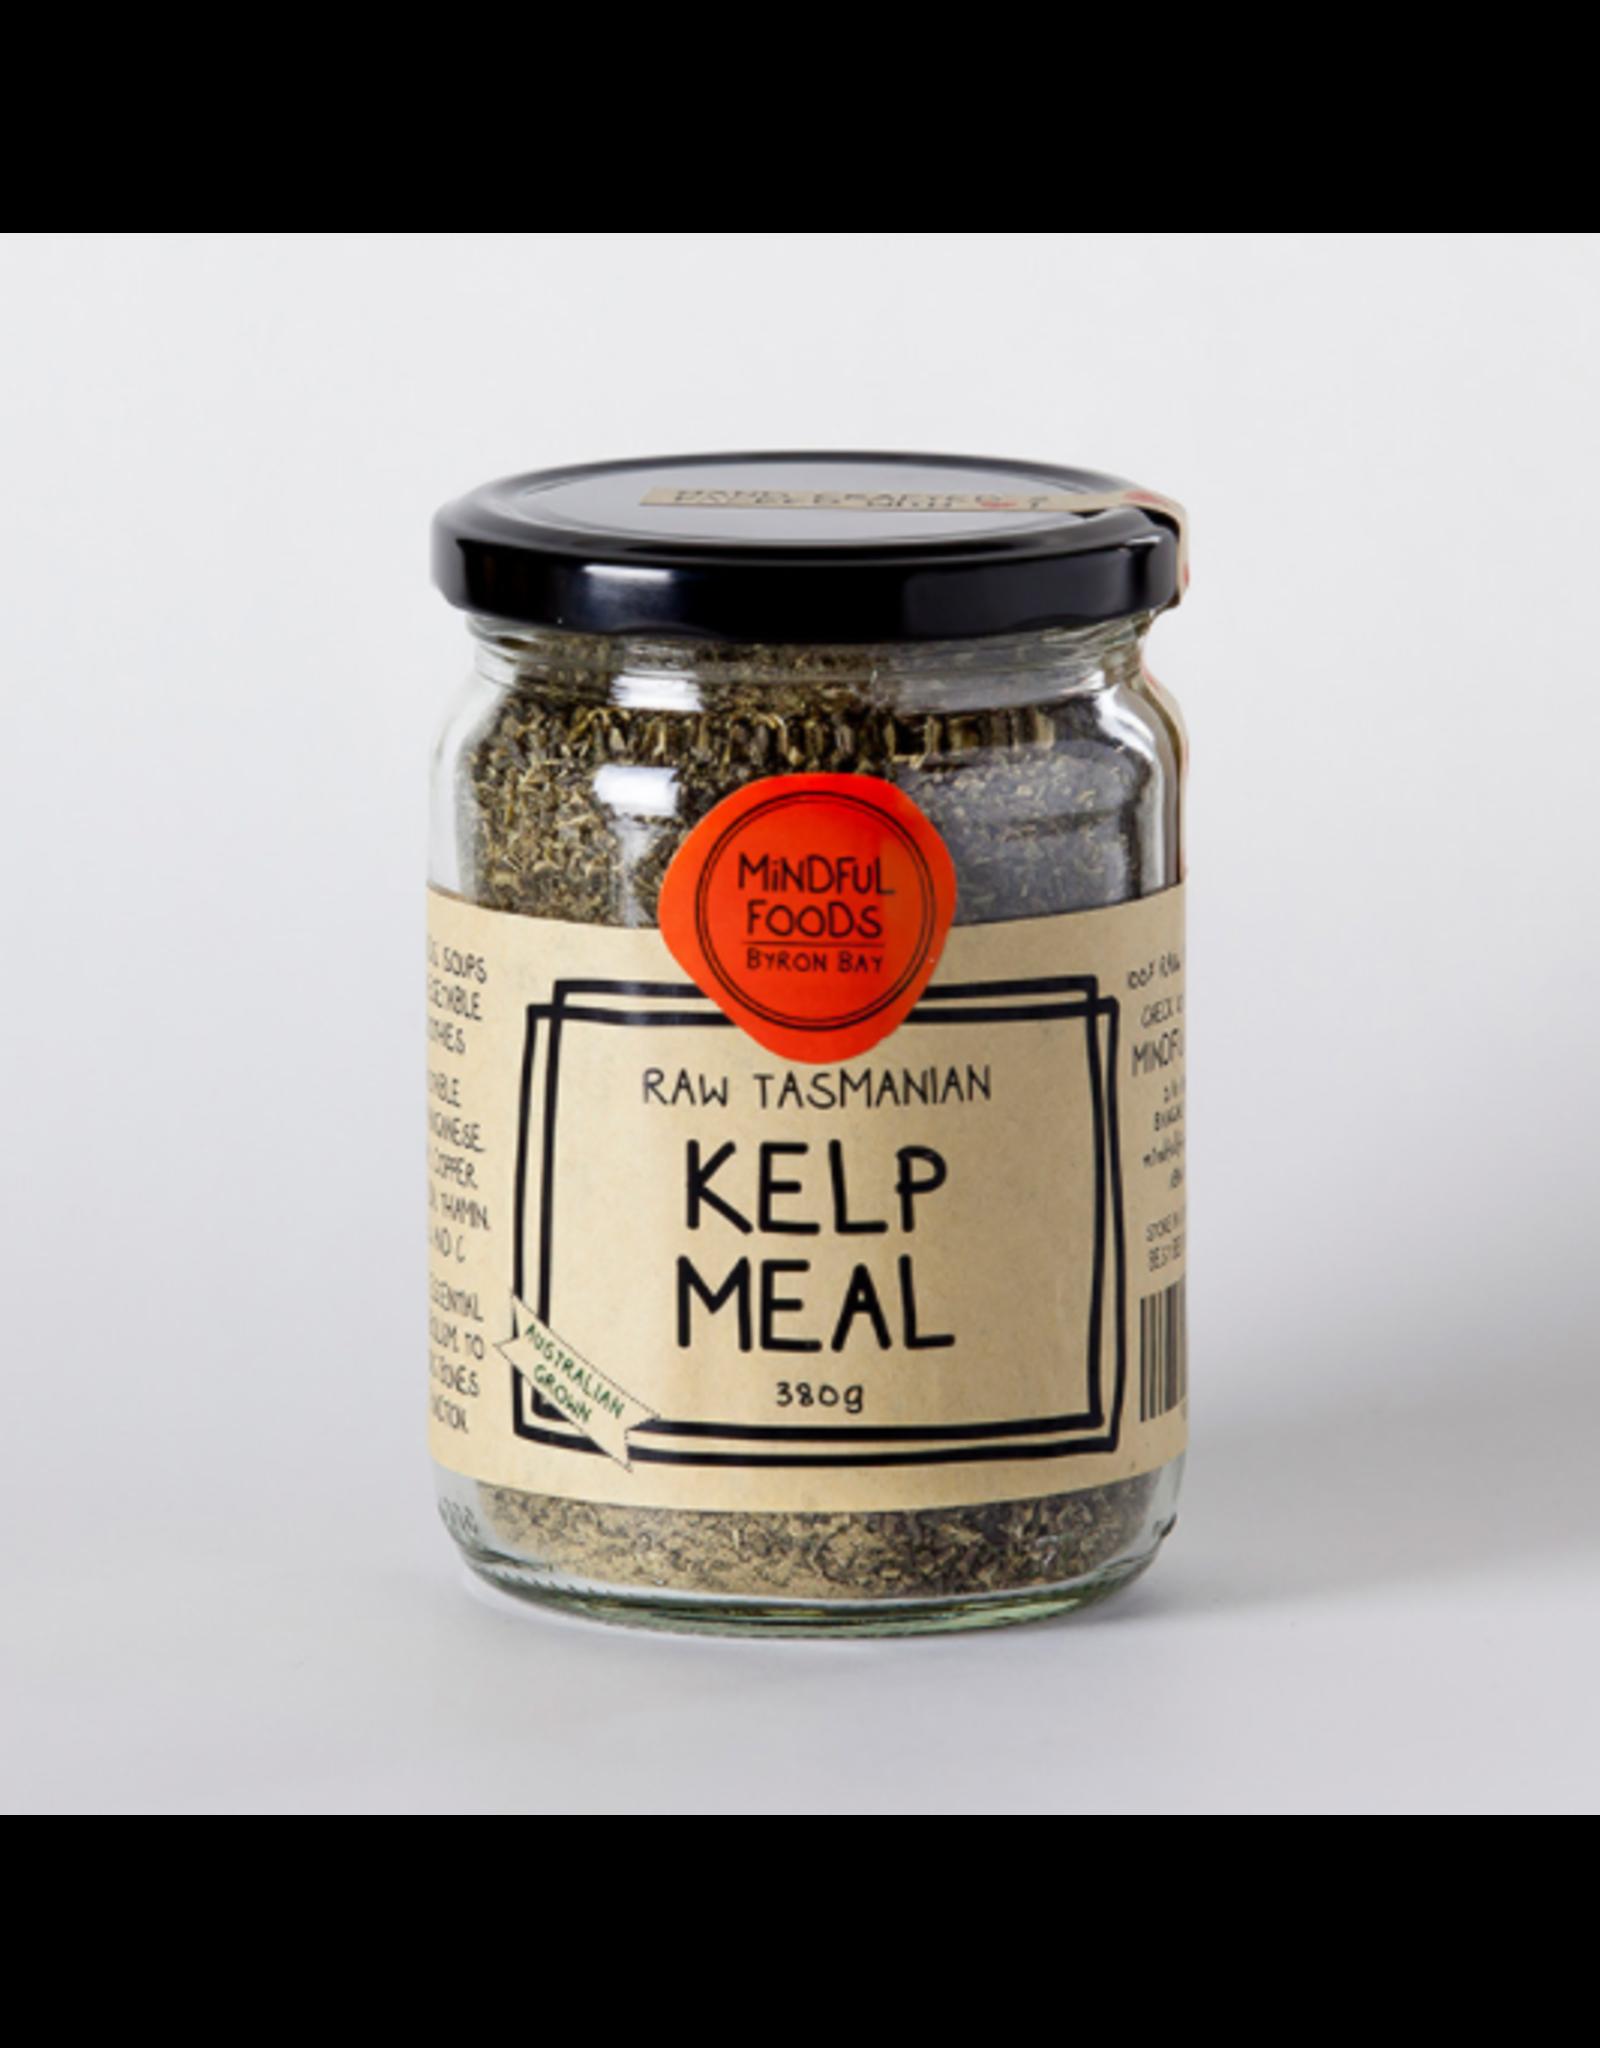 Mindful Foods Kelp Meal Raw Tasmanian 180g jar